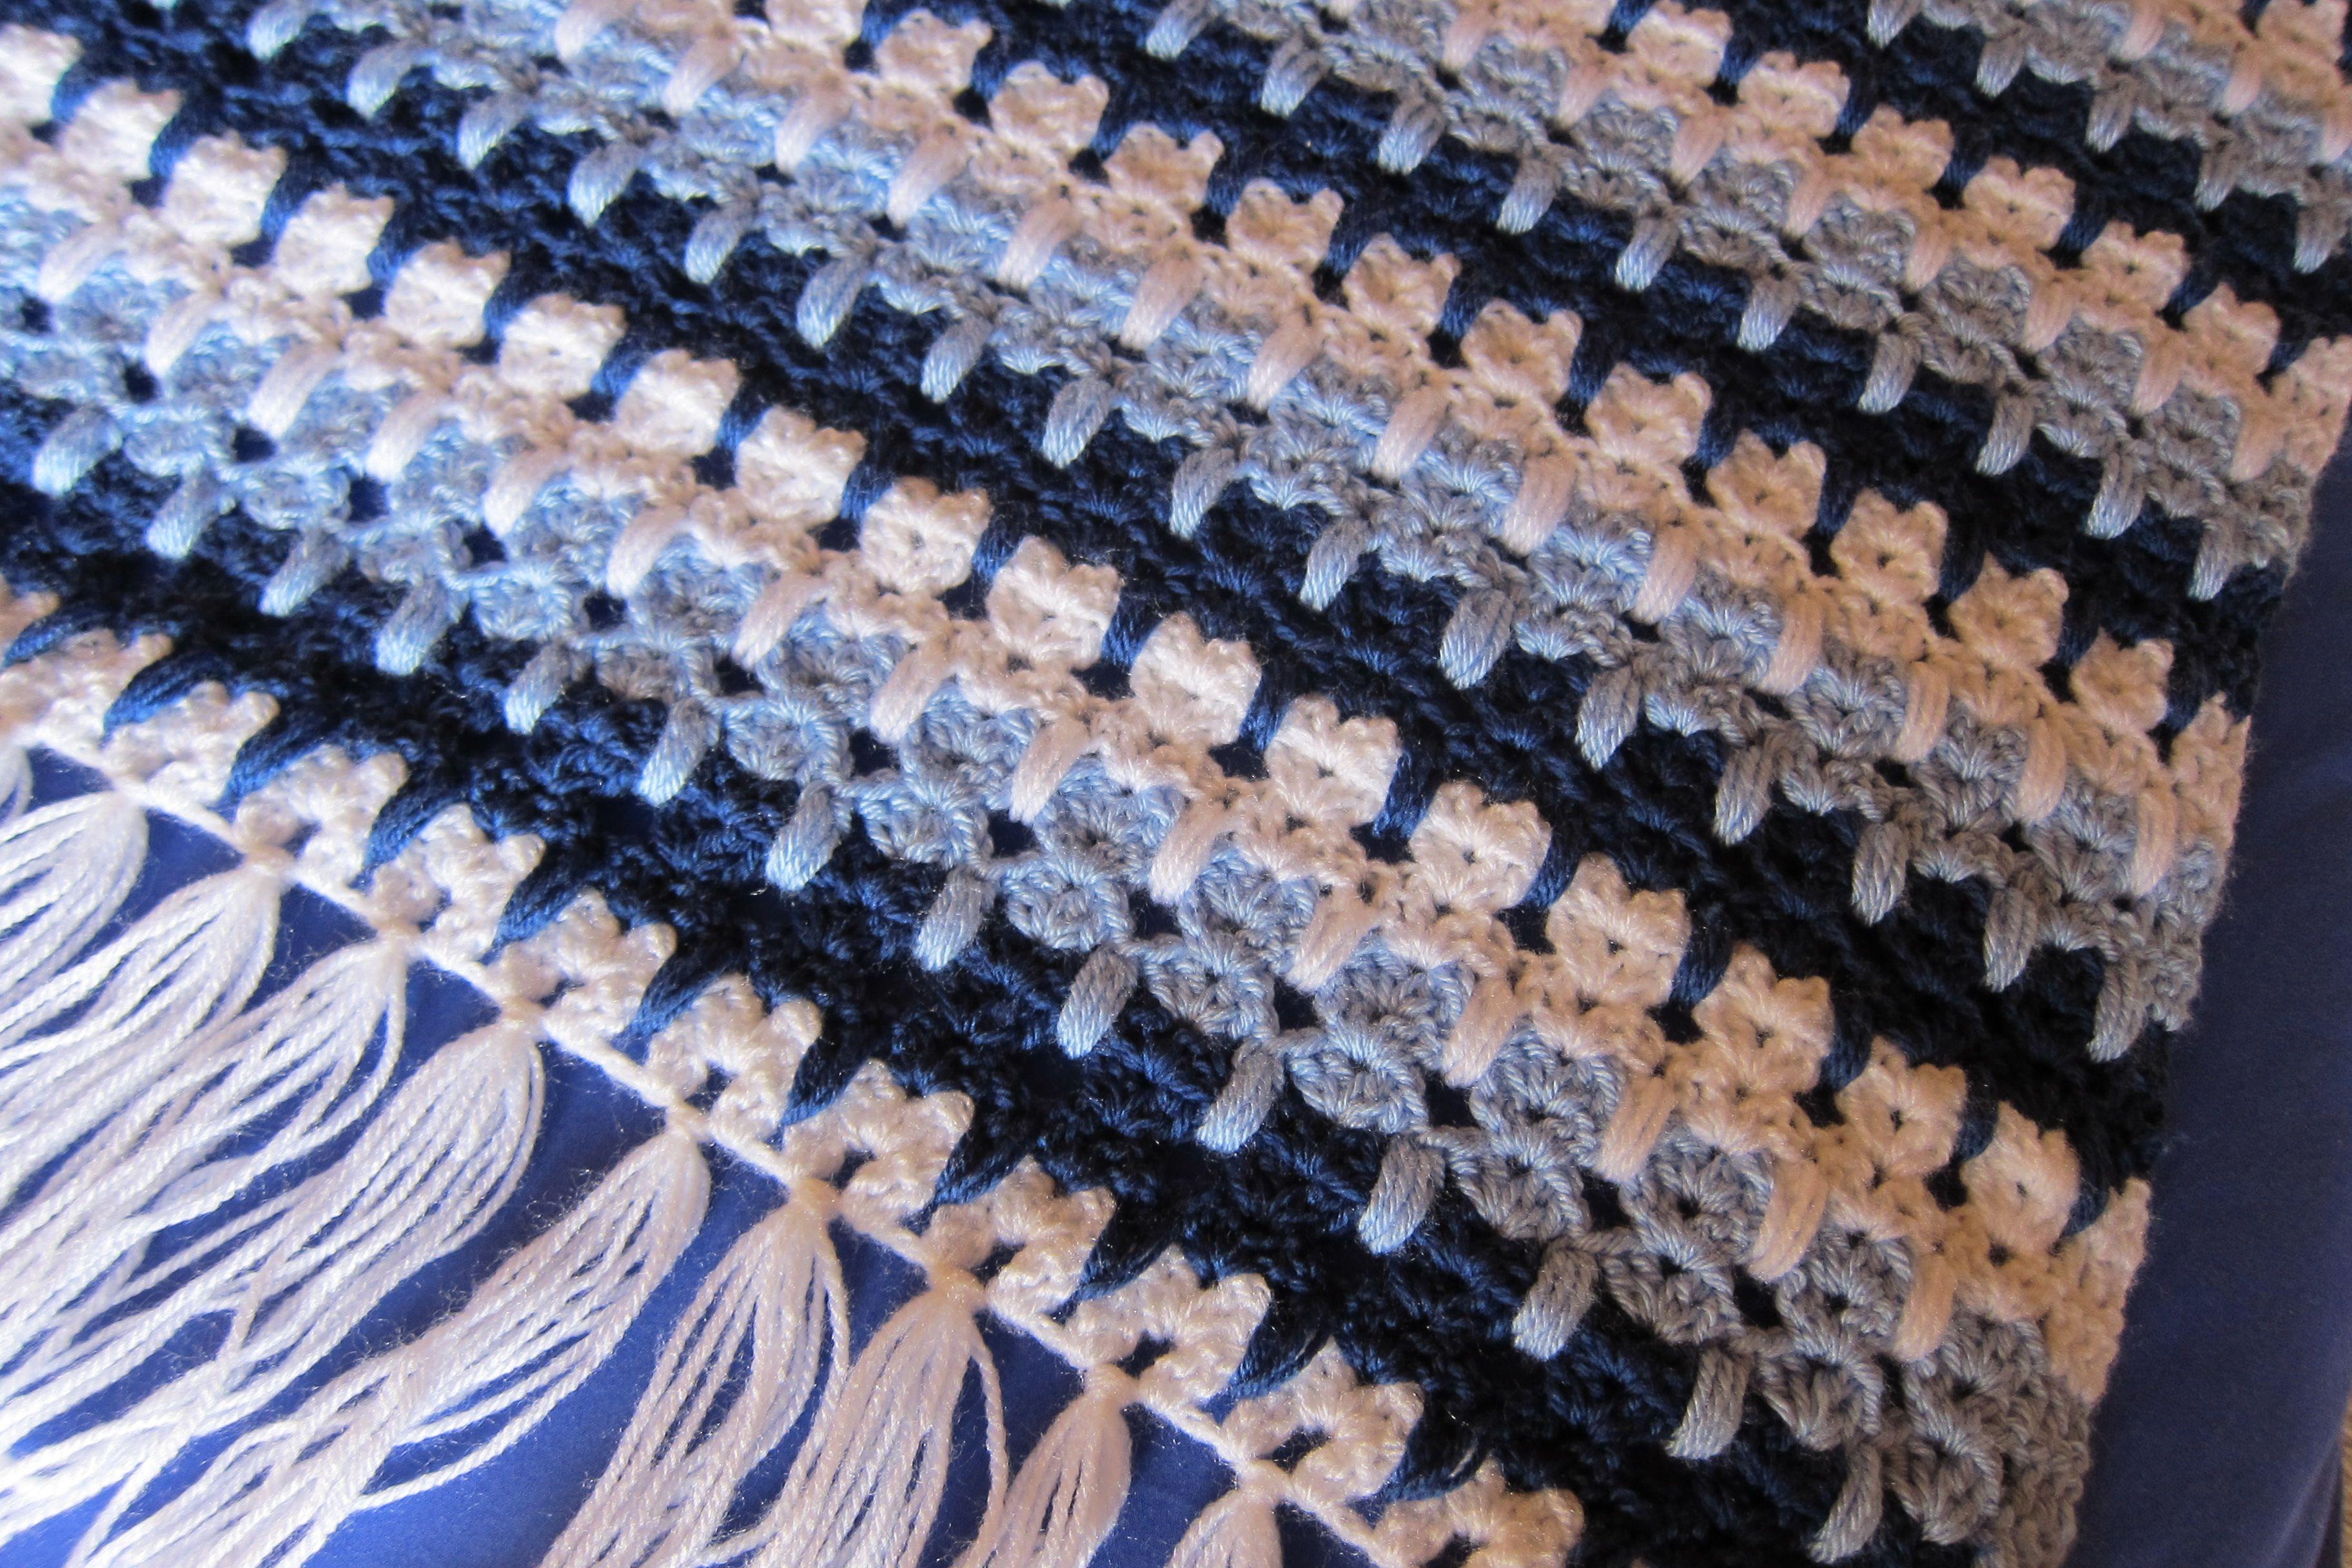 Crocheted Pussycat Knee Rug Stuff I Ve Made Crochet